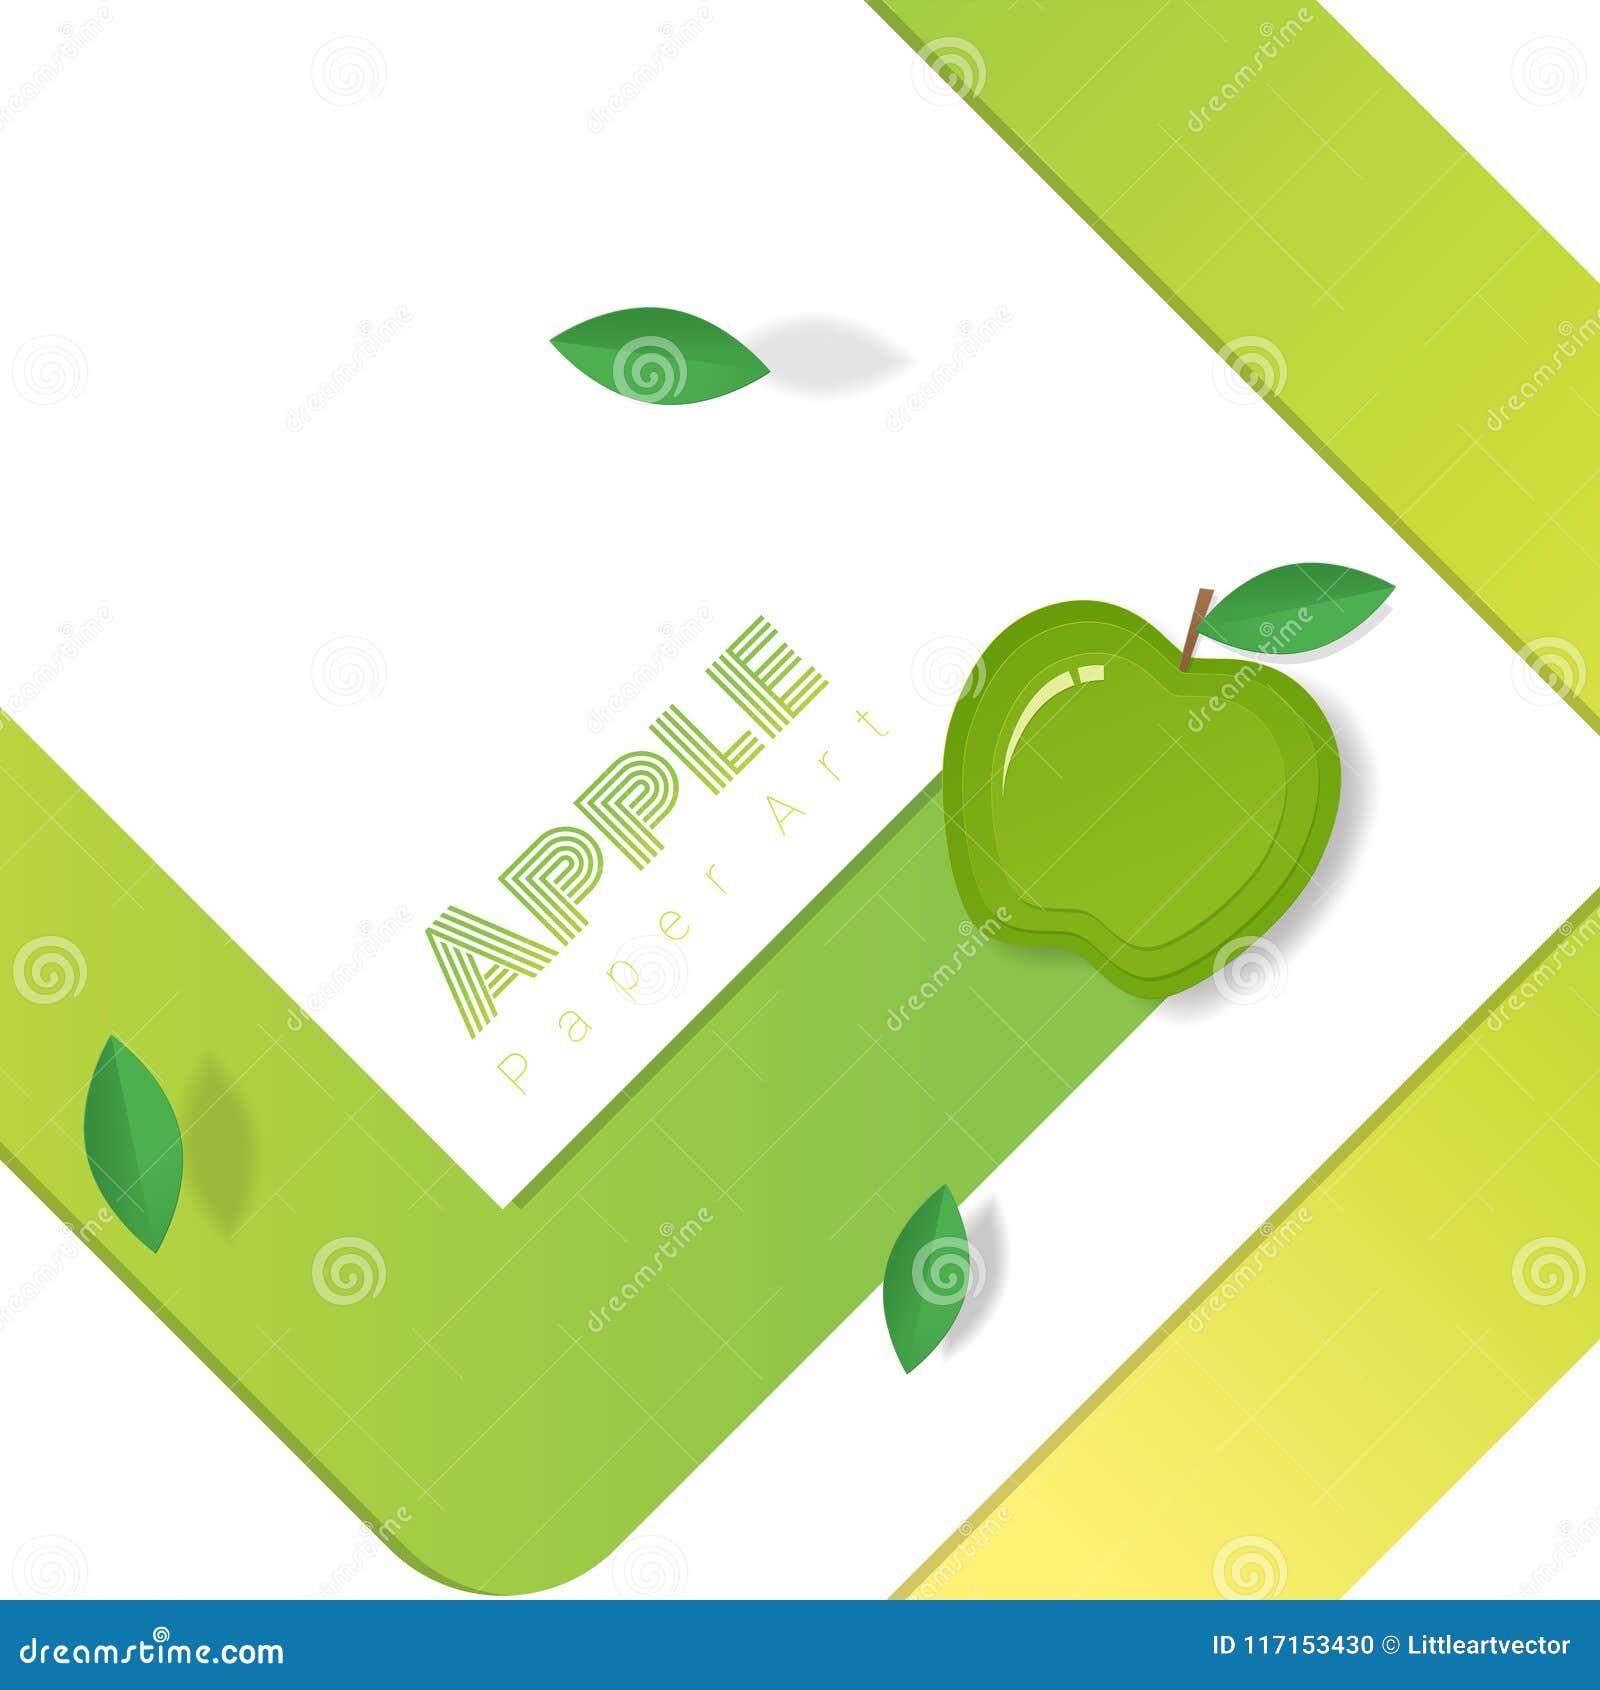 Fresh green apple fruit background in paper art style